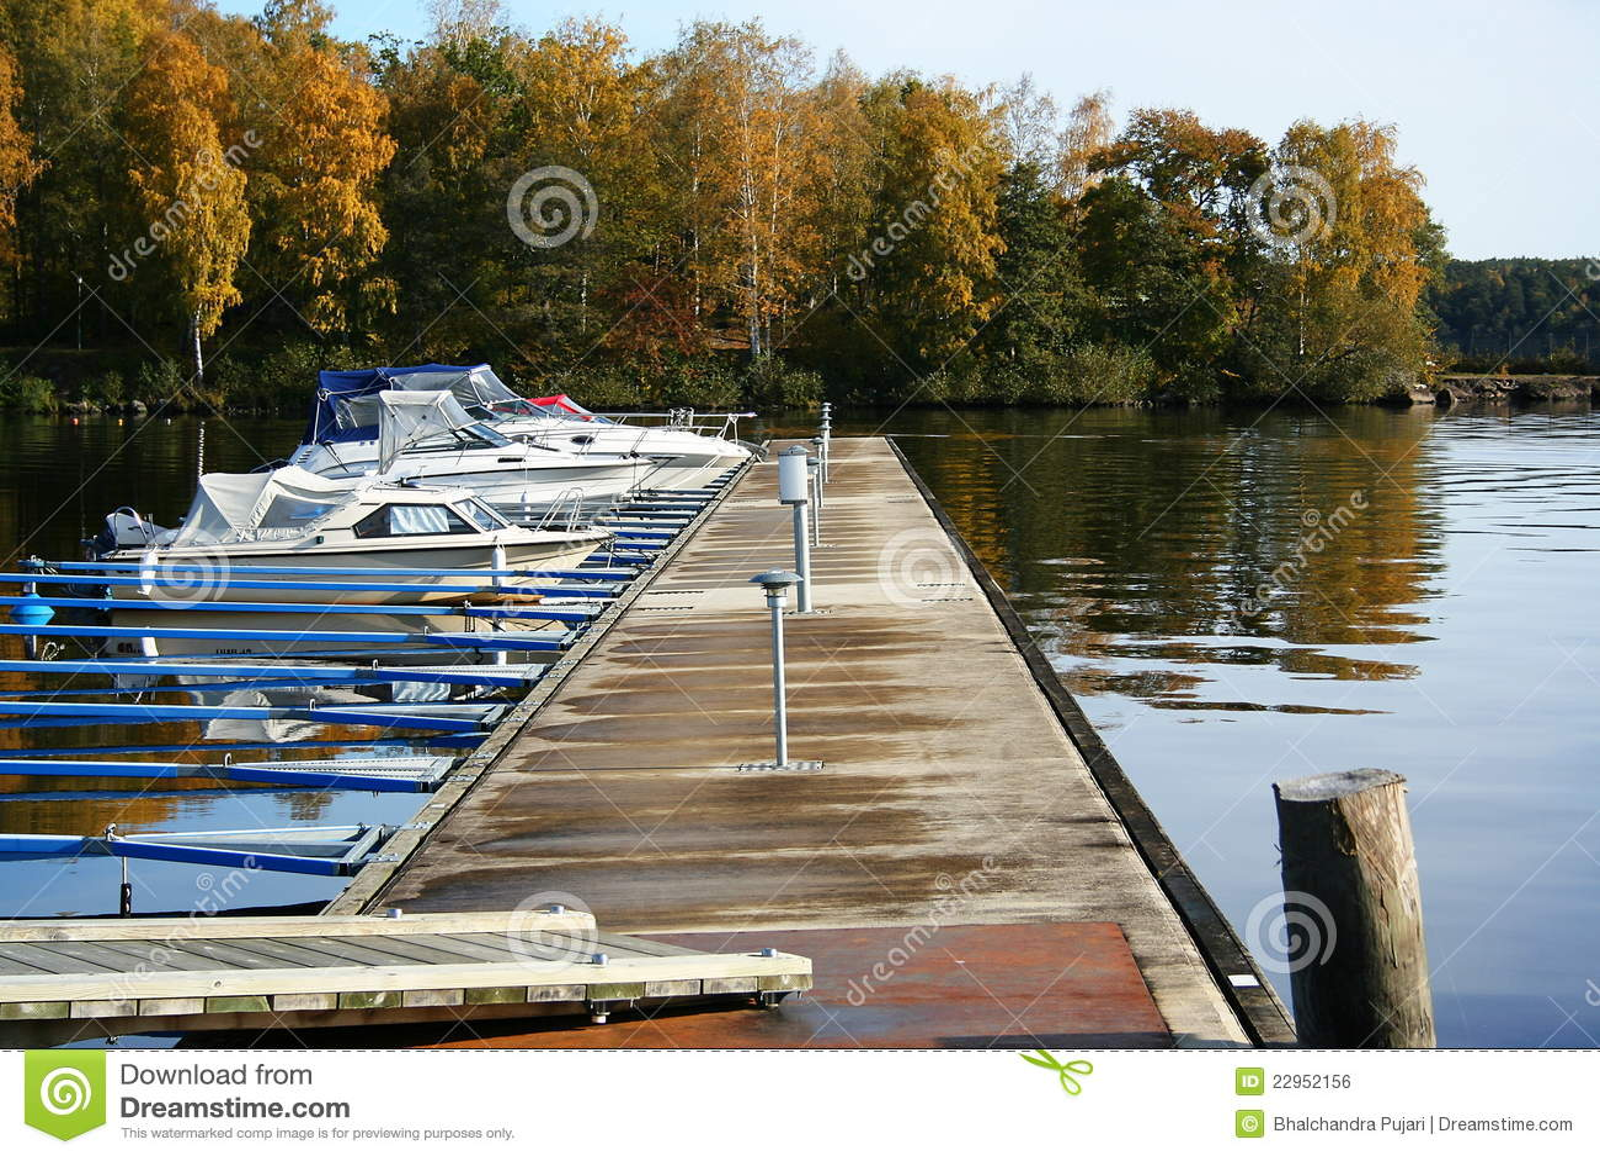 Boat Parking Royalty Free Stock Image - Image: 22952156